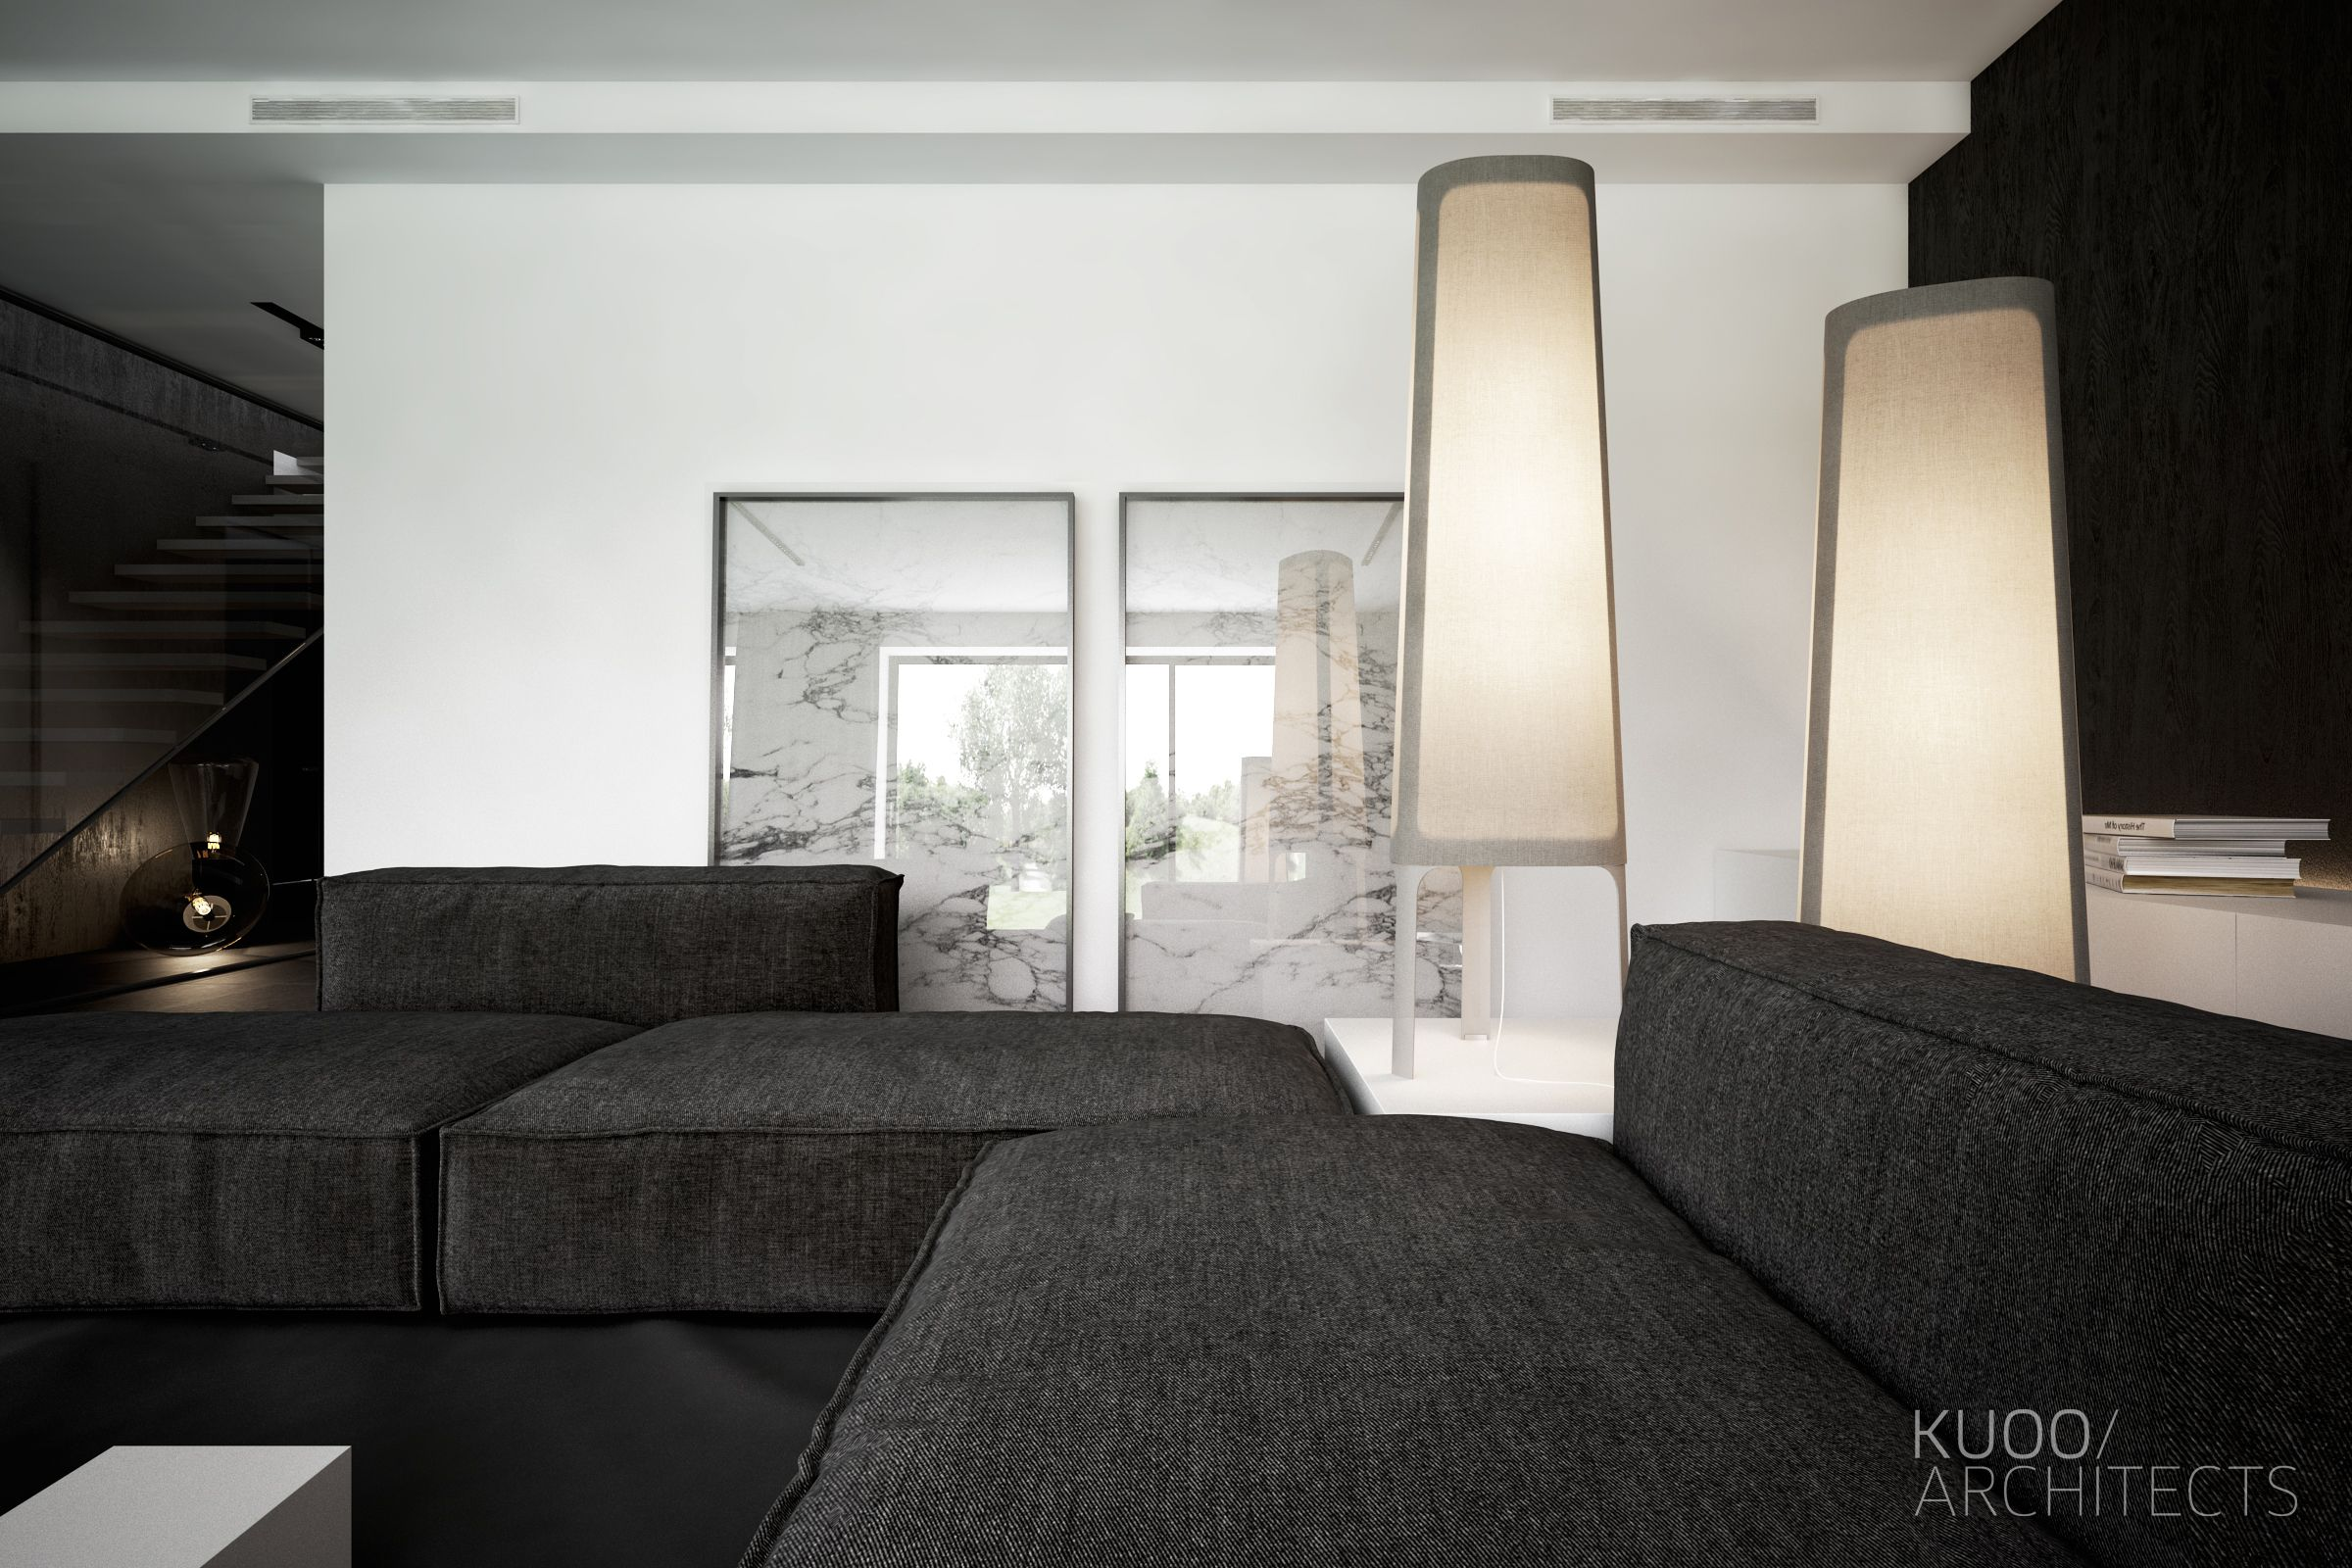 kuoo_architects_interior_design_minimal_contemporary (35) logo